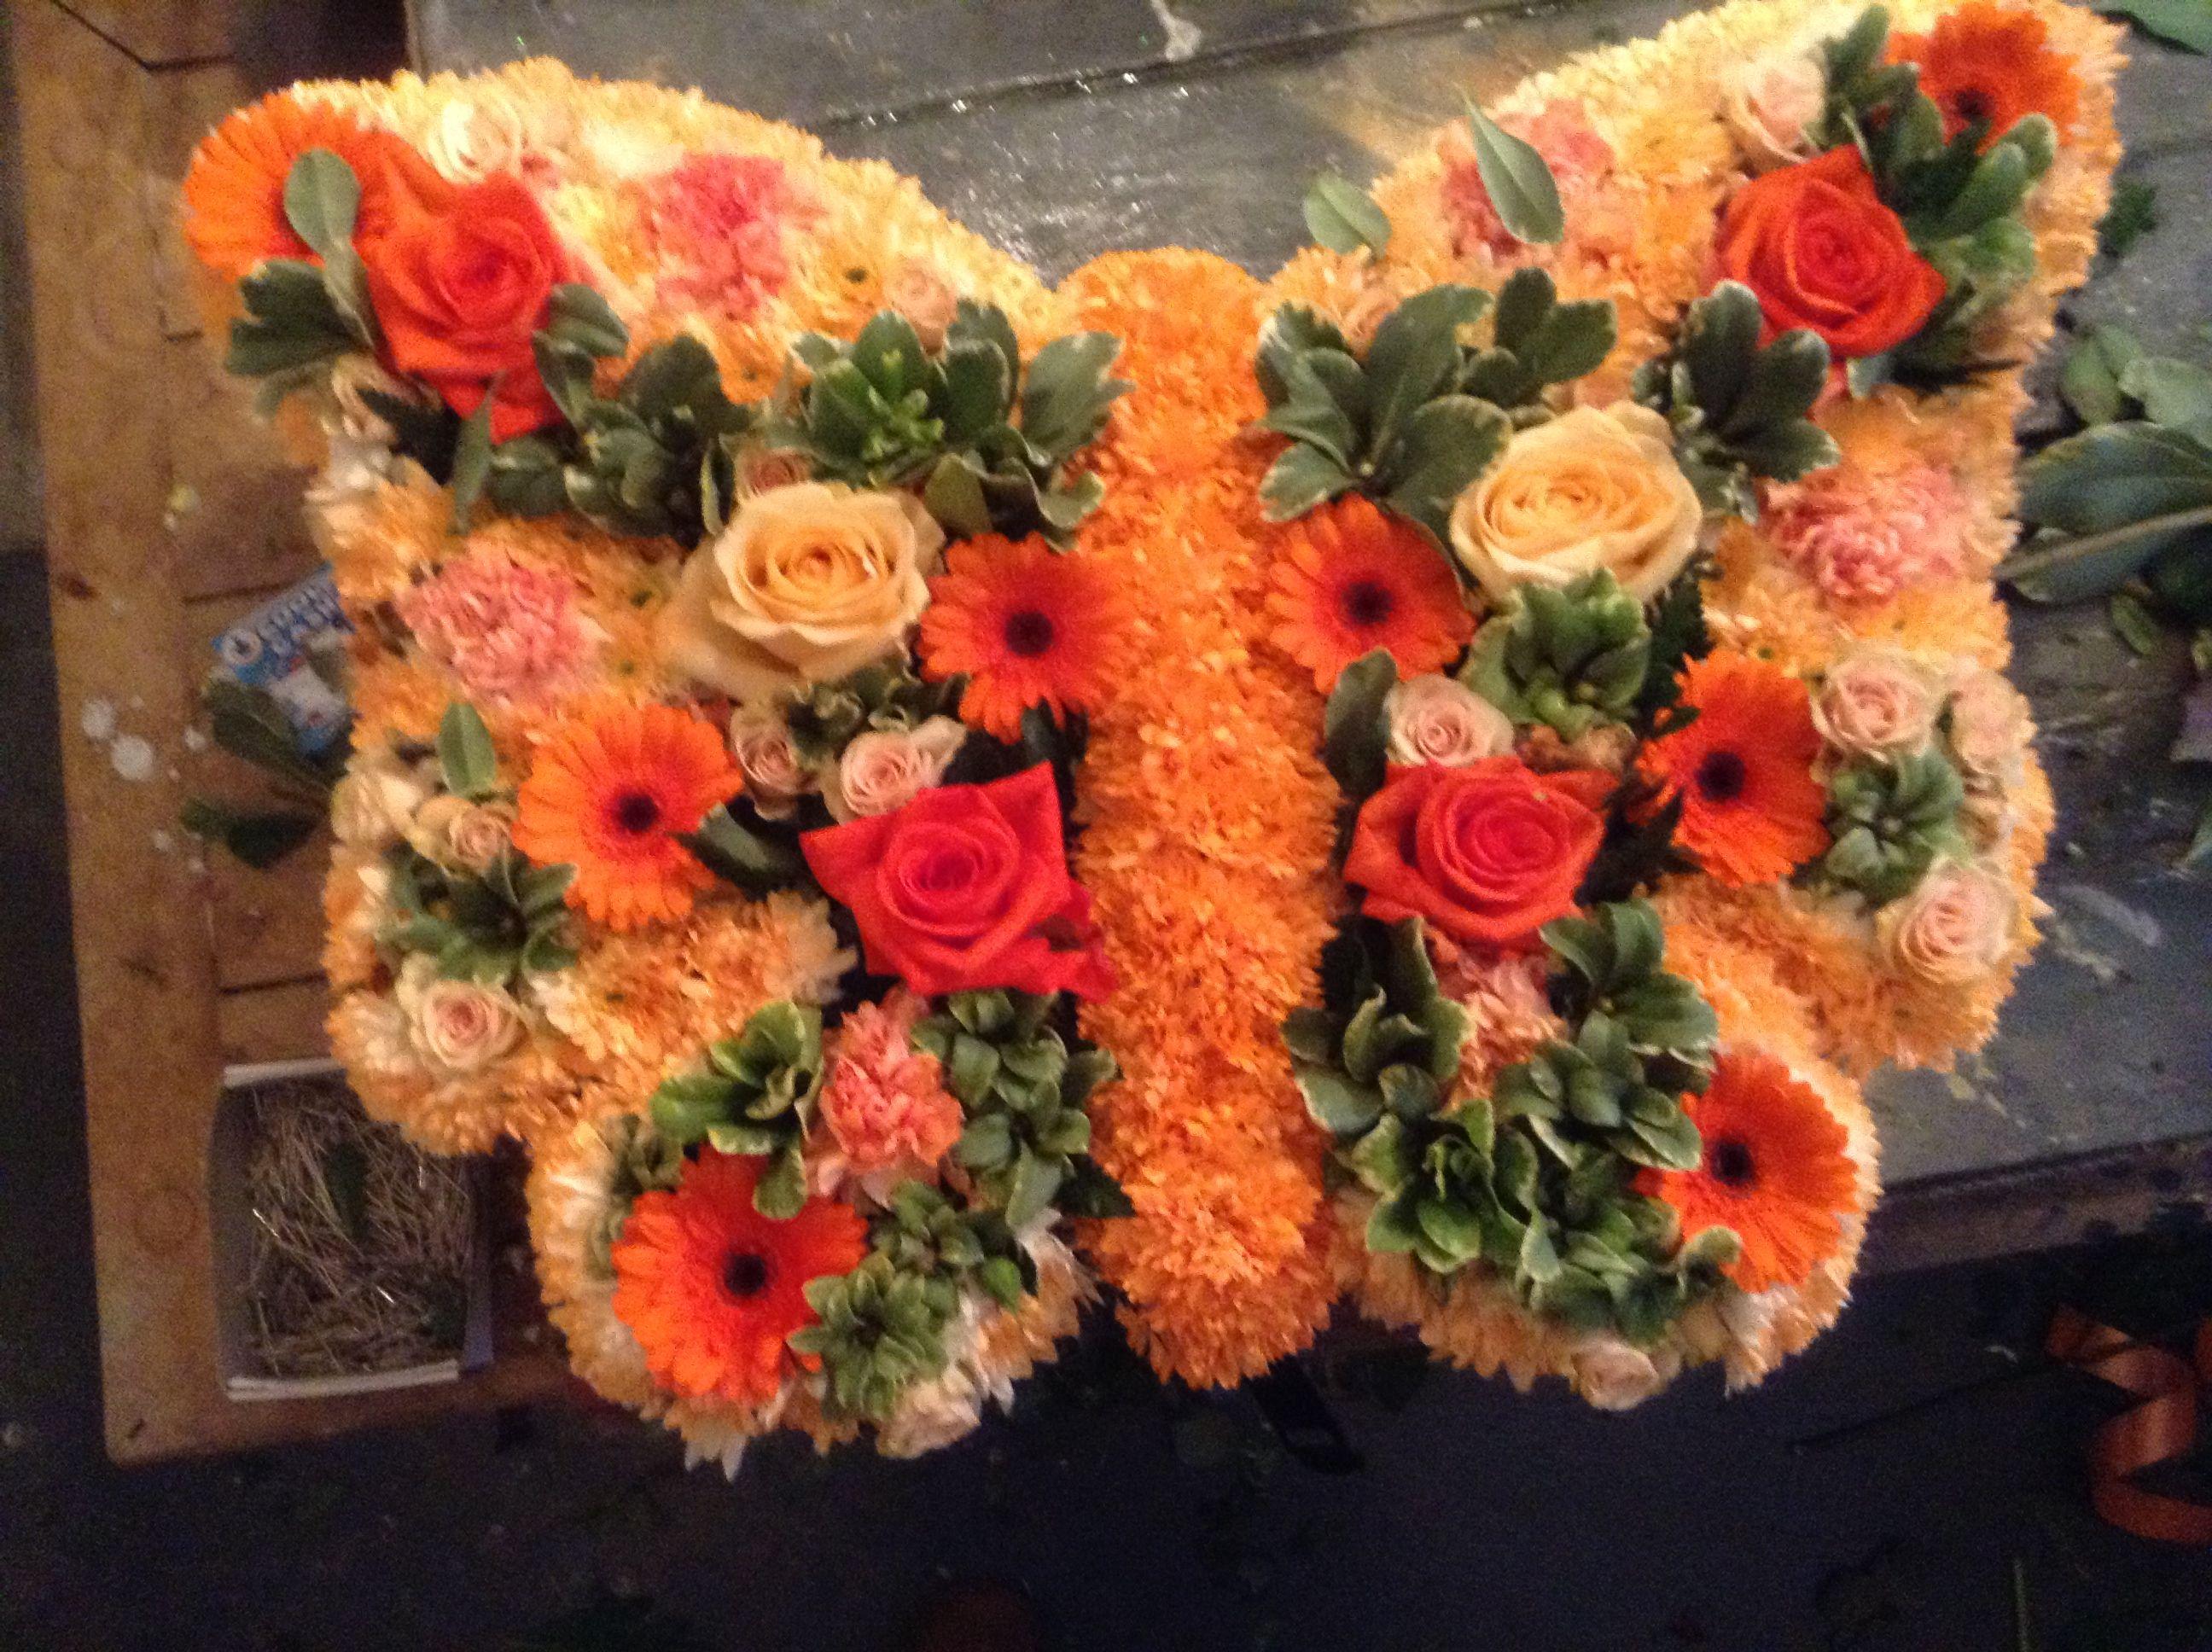 Funeral flowers orange butterfly funeral flower tribute bespoke funeral flowers orange butterfly funeral flower tribute bespoke funeral flowers unusual funeral flowers izmirmasajfo